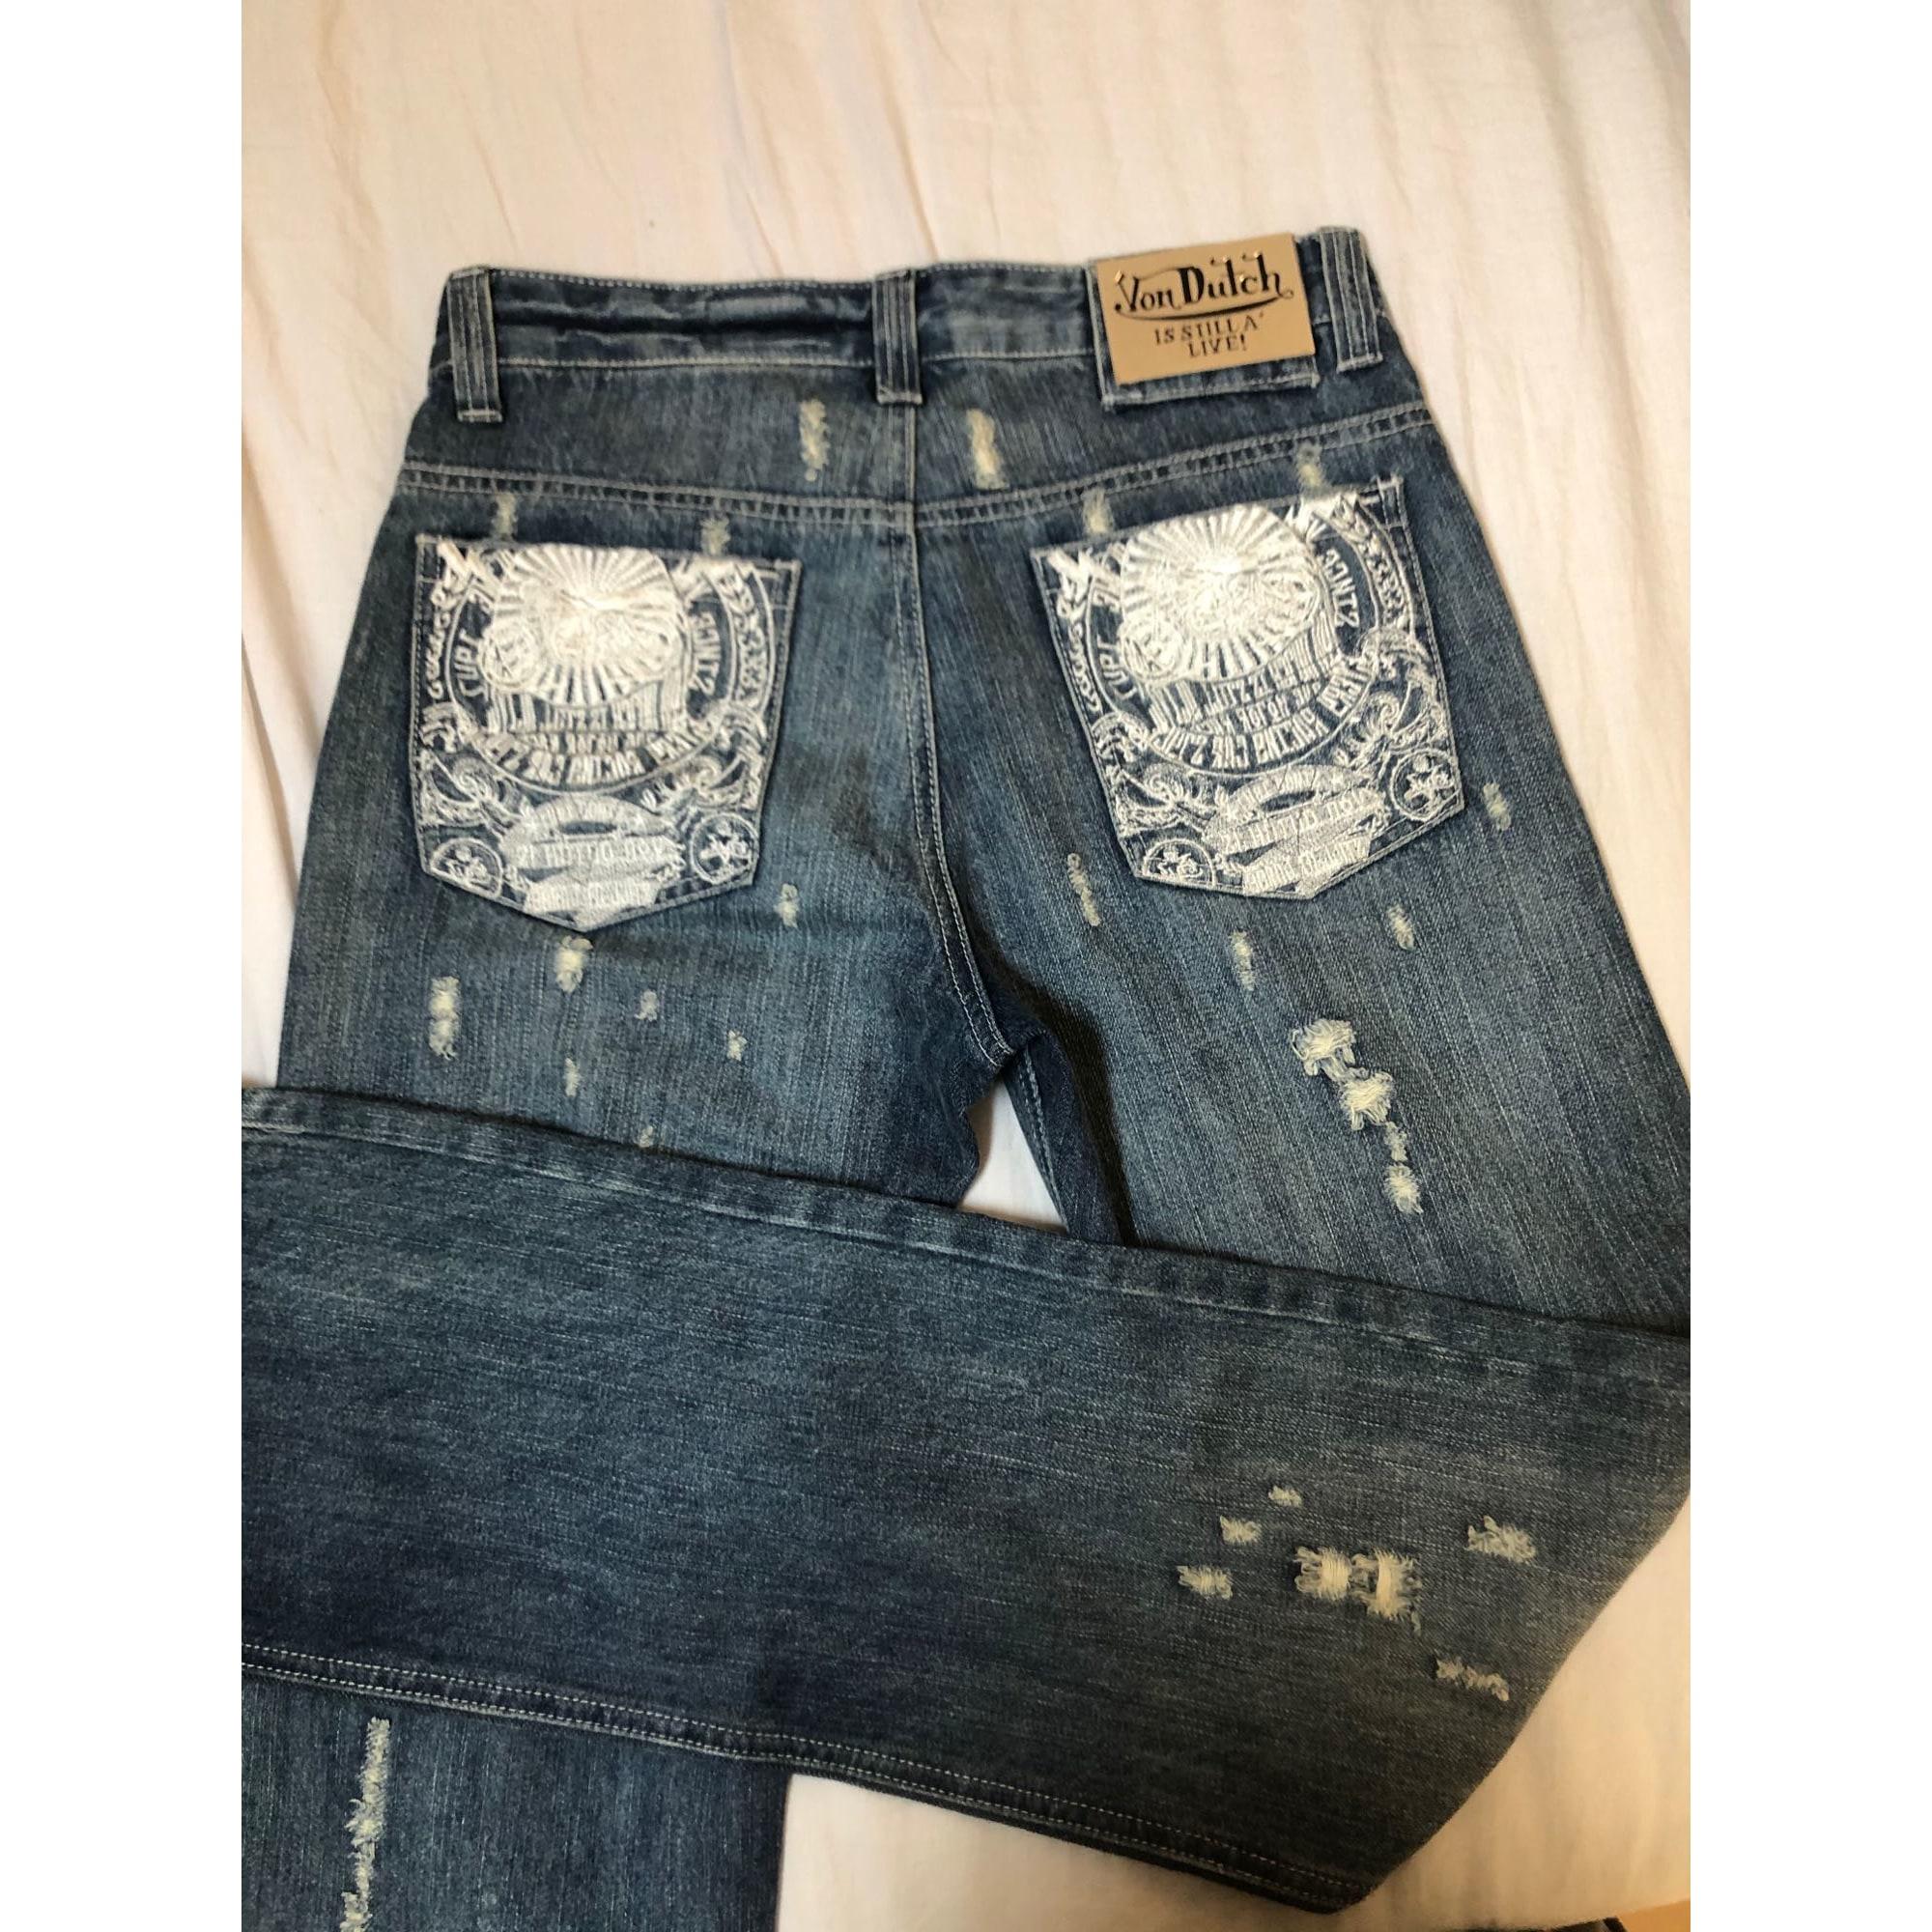 Jeans droit VON DUTCH Bleu, bleu marine, bleu turquoise